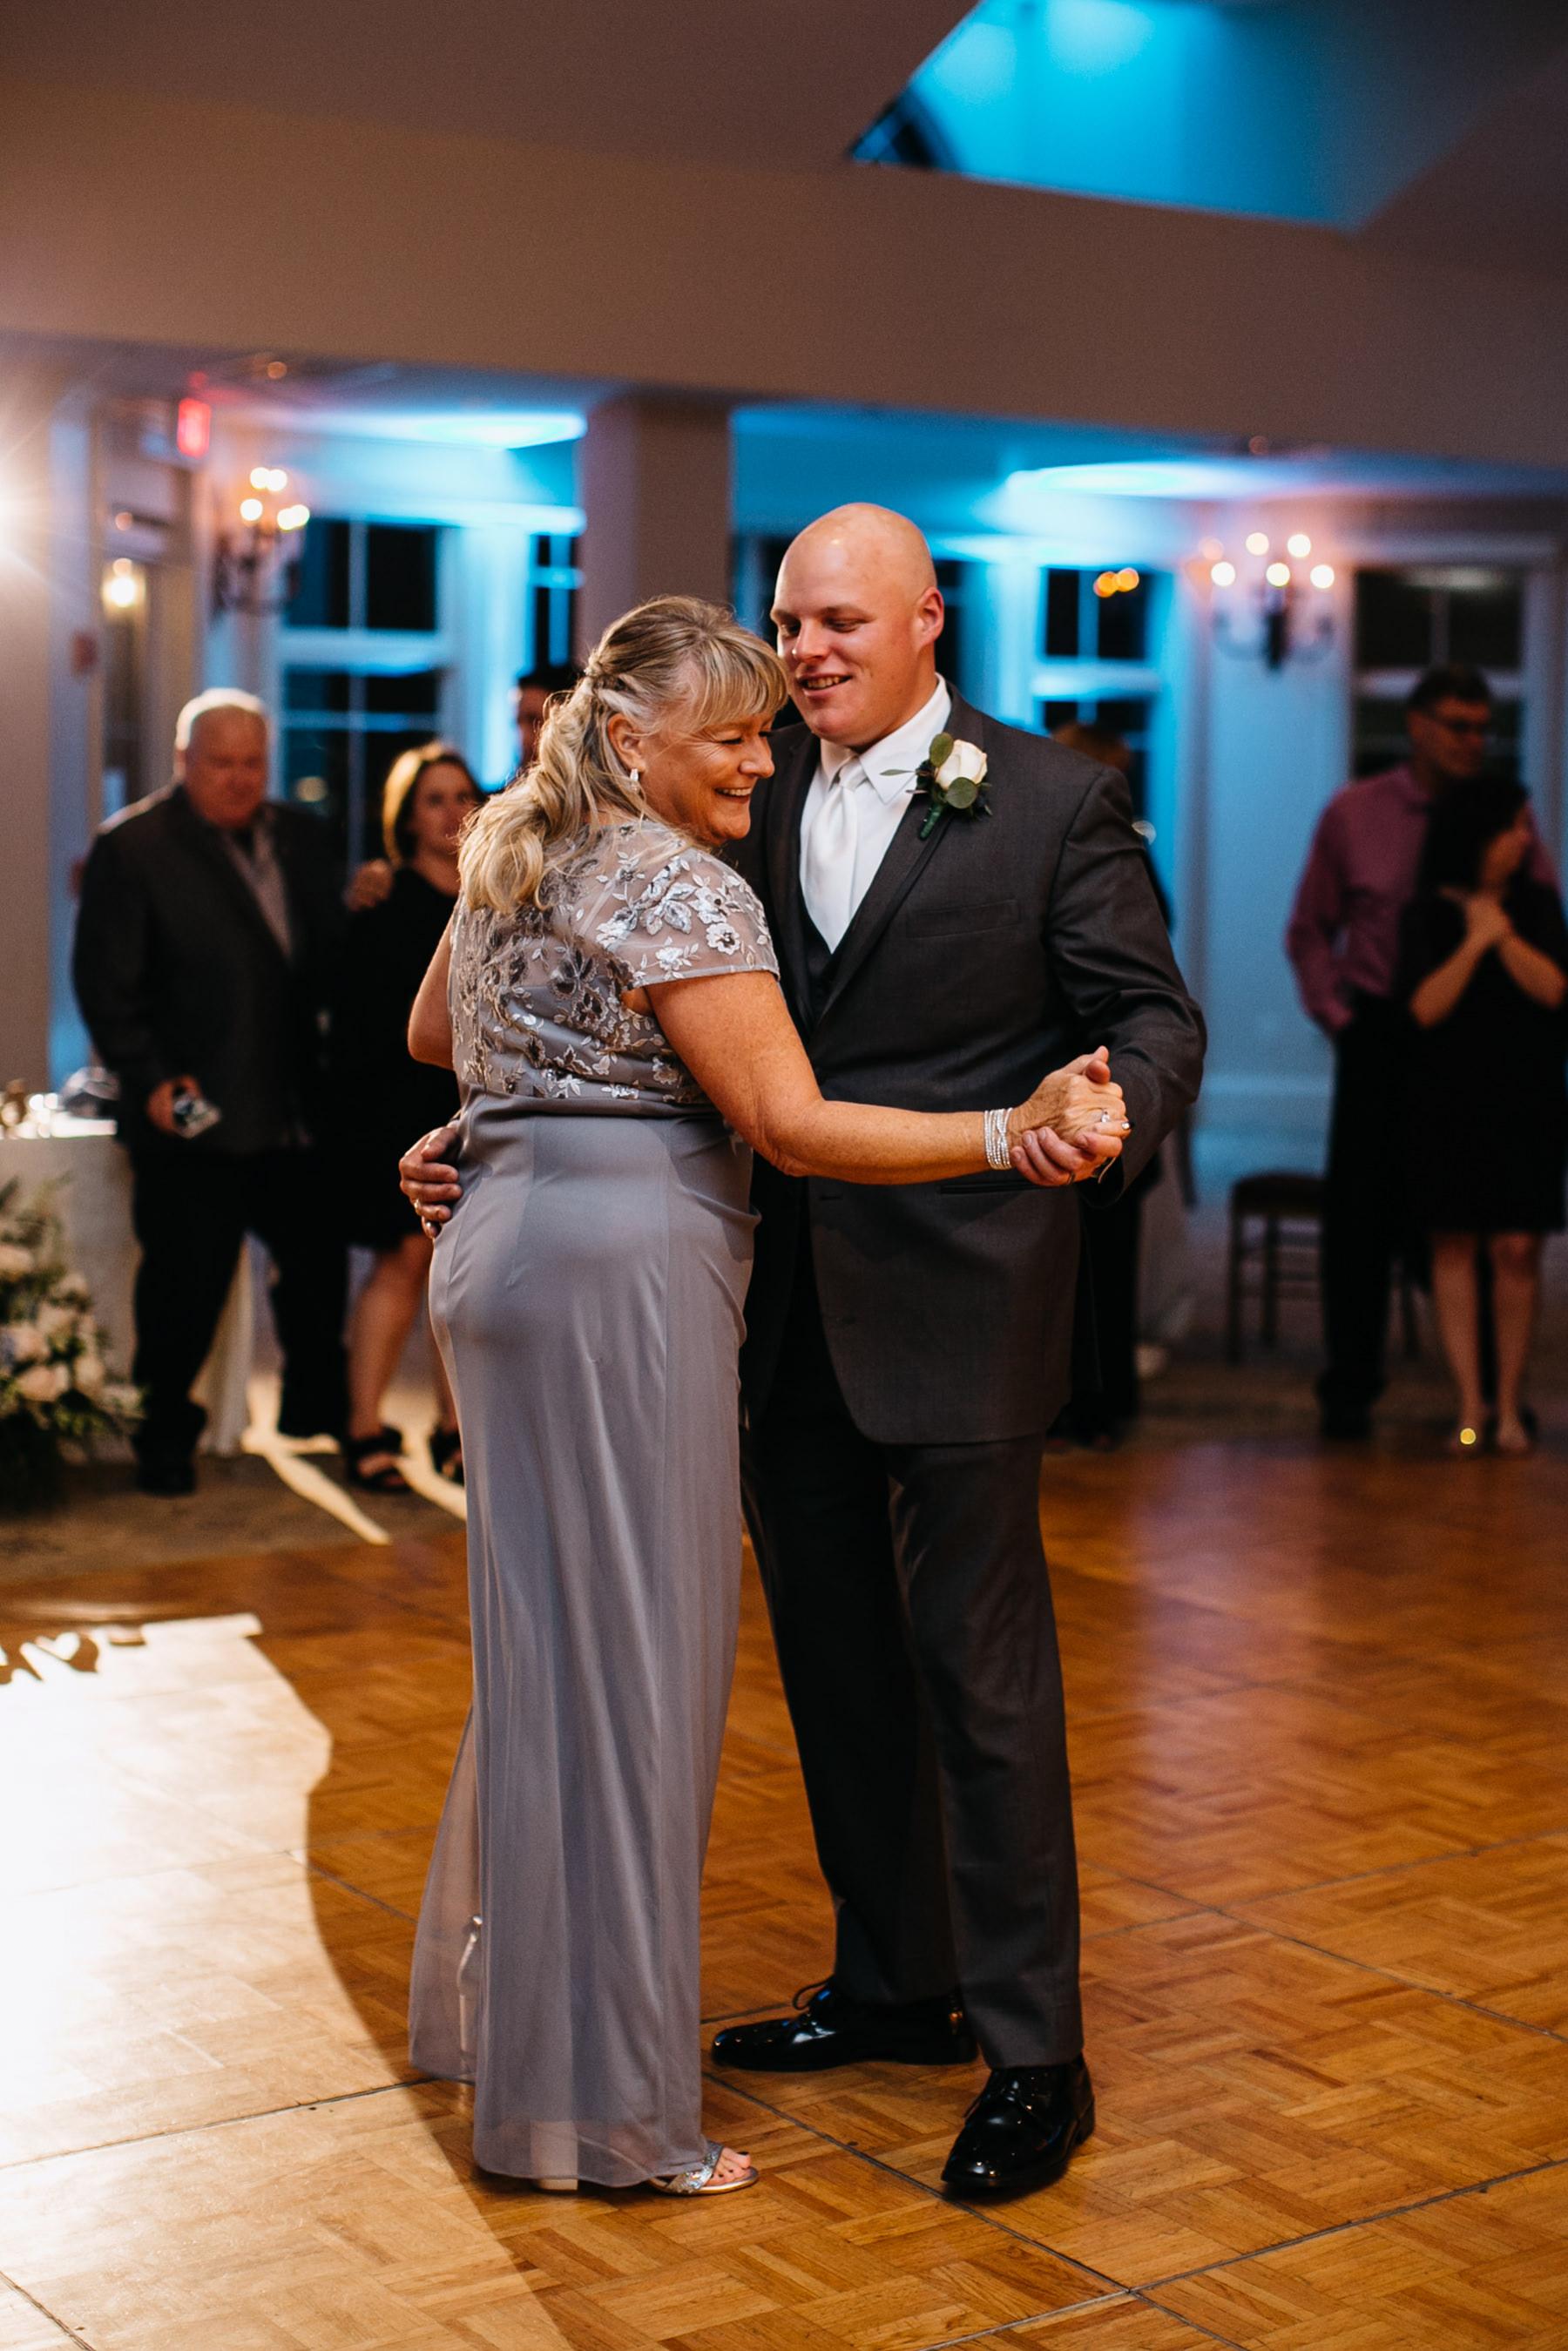 Quincy Ma Massachusetts Wedding Dedham Boston Granie Links Wedding New England Catholic Cathedral Liz Osban Photography 113.jpg